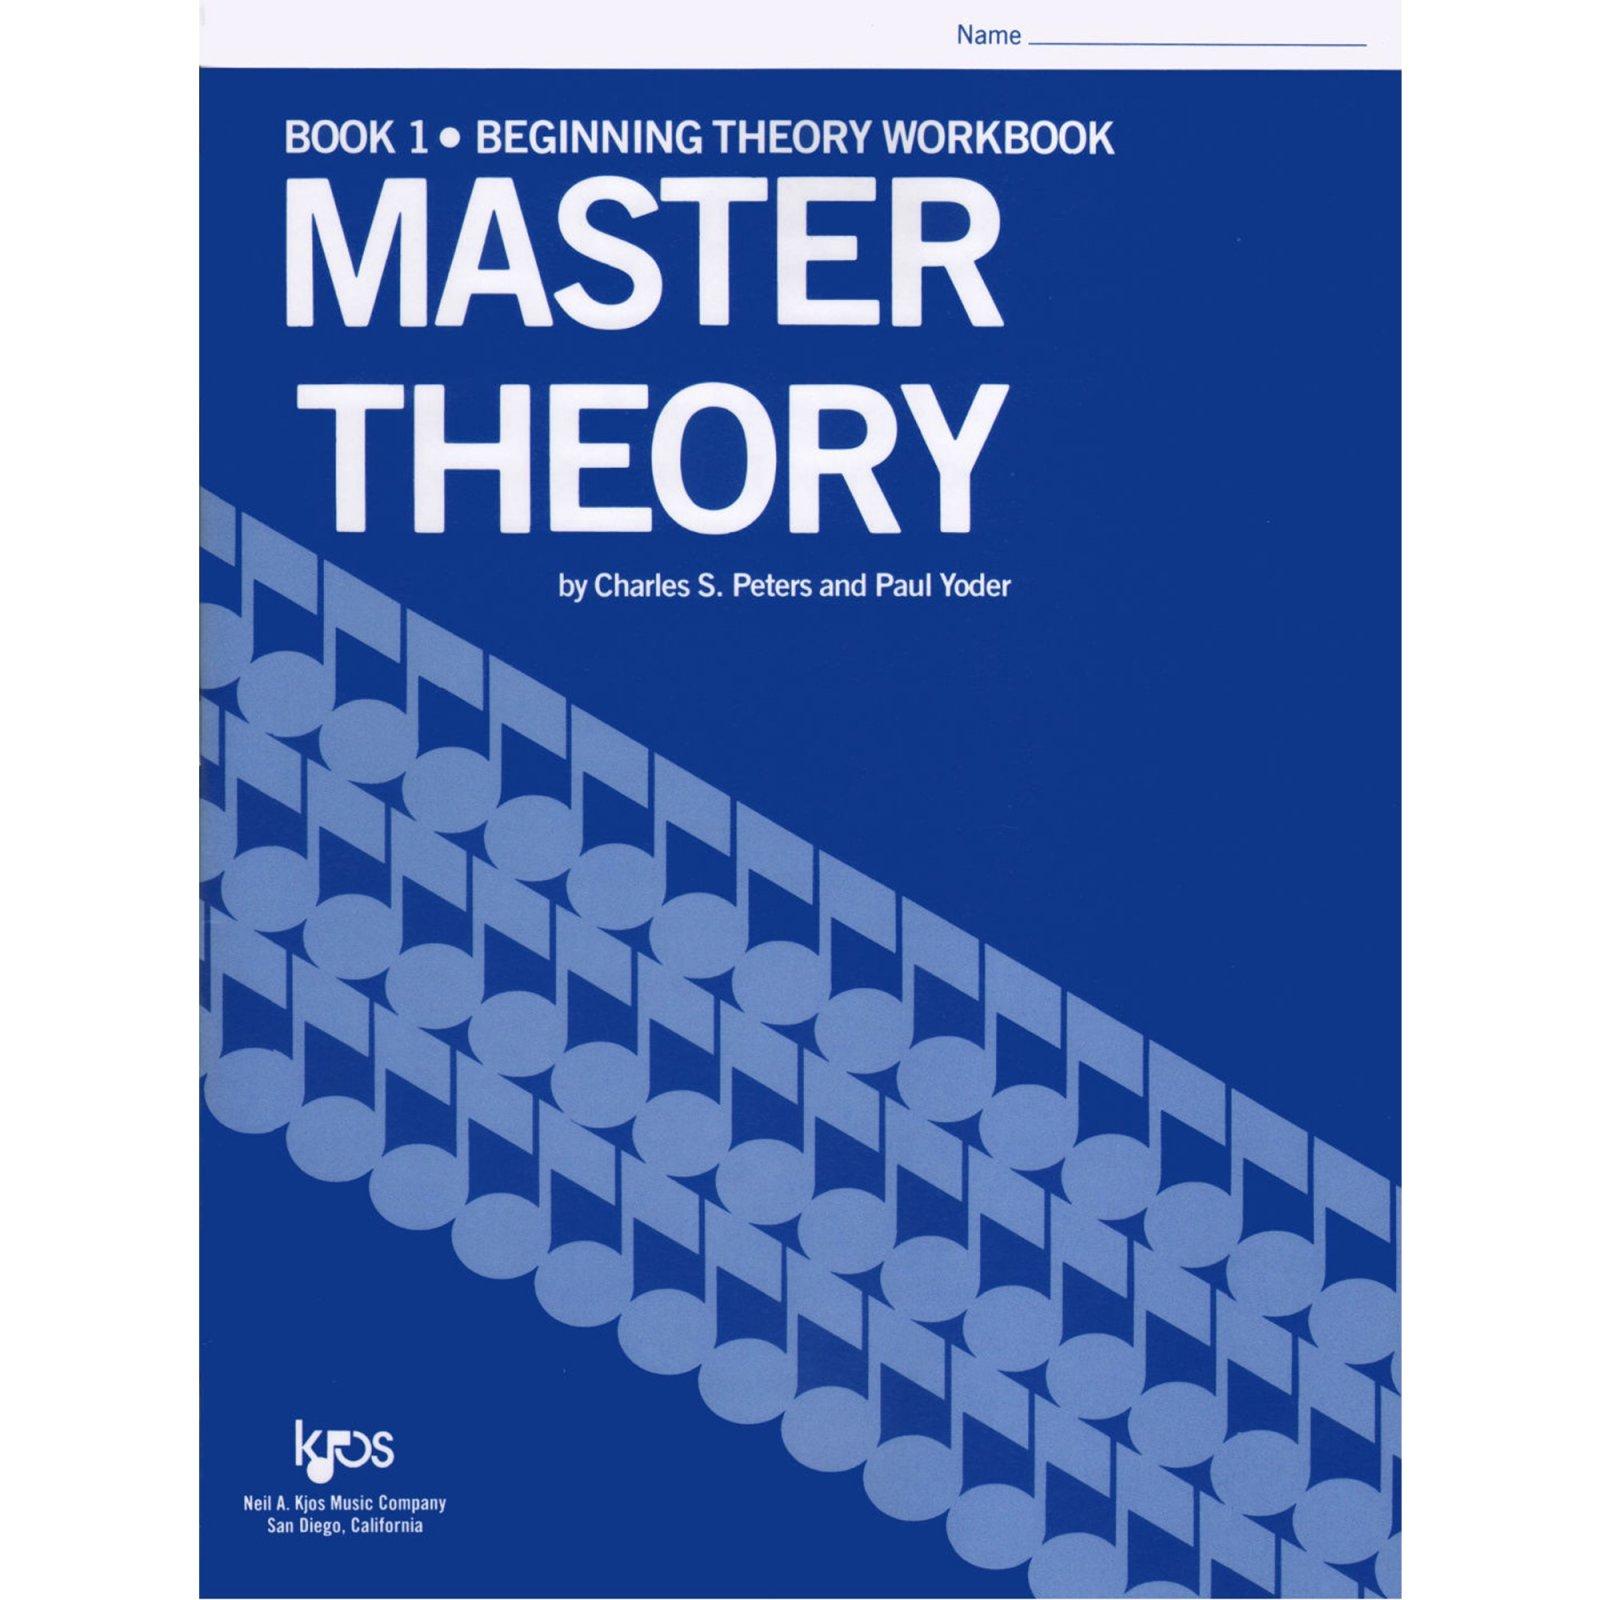 Master Theory Book 1- Beginning Theory Workbook